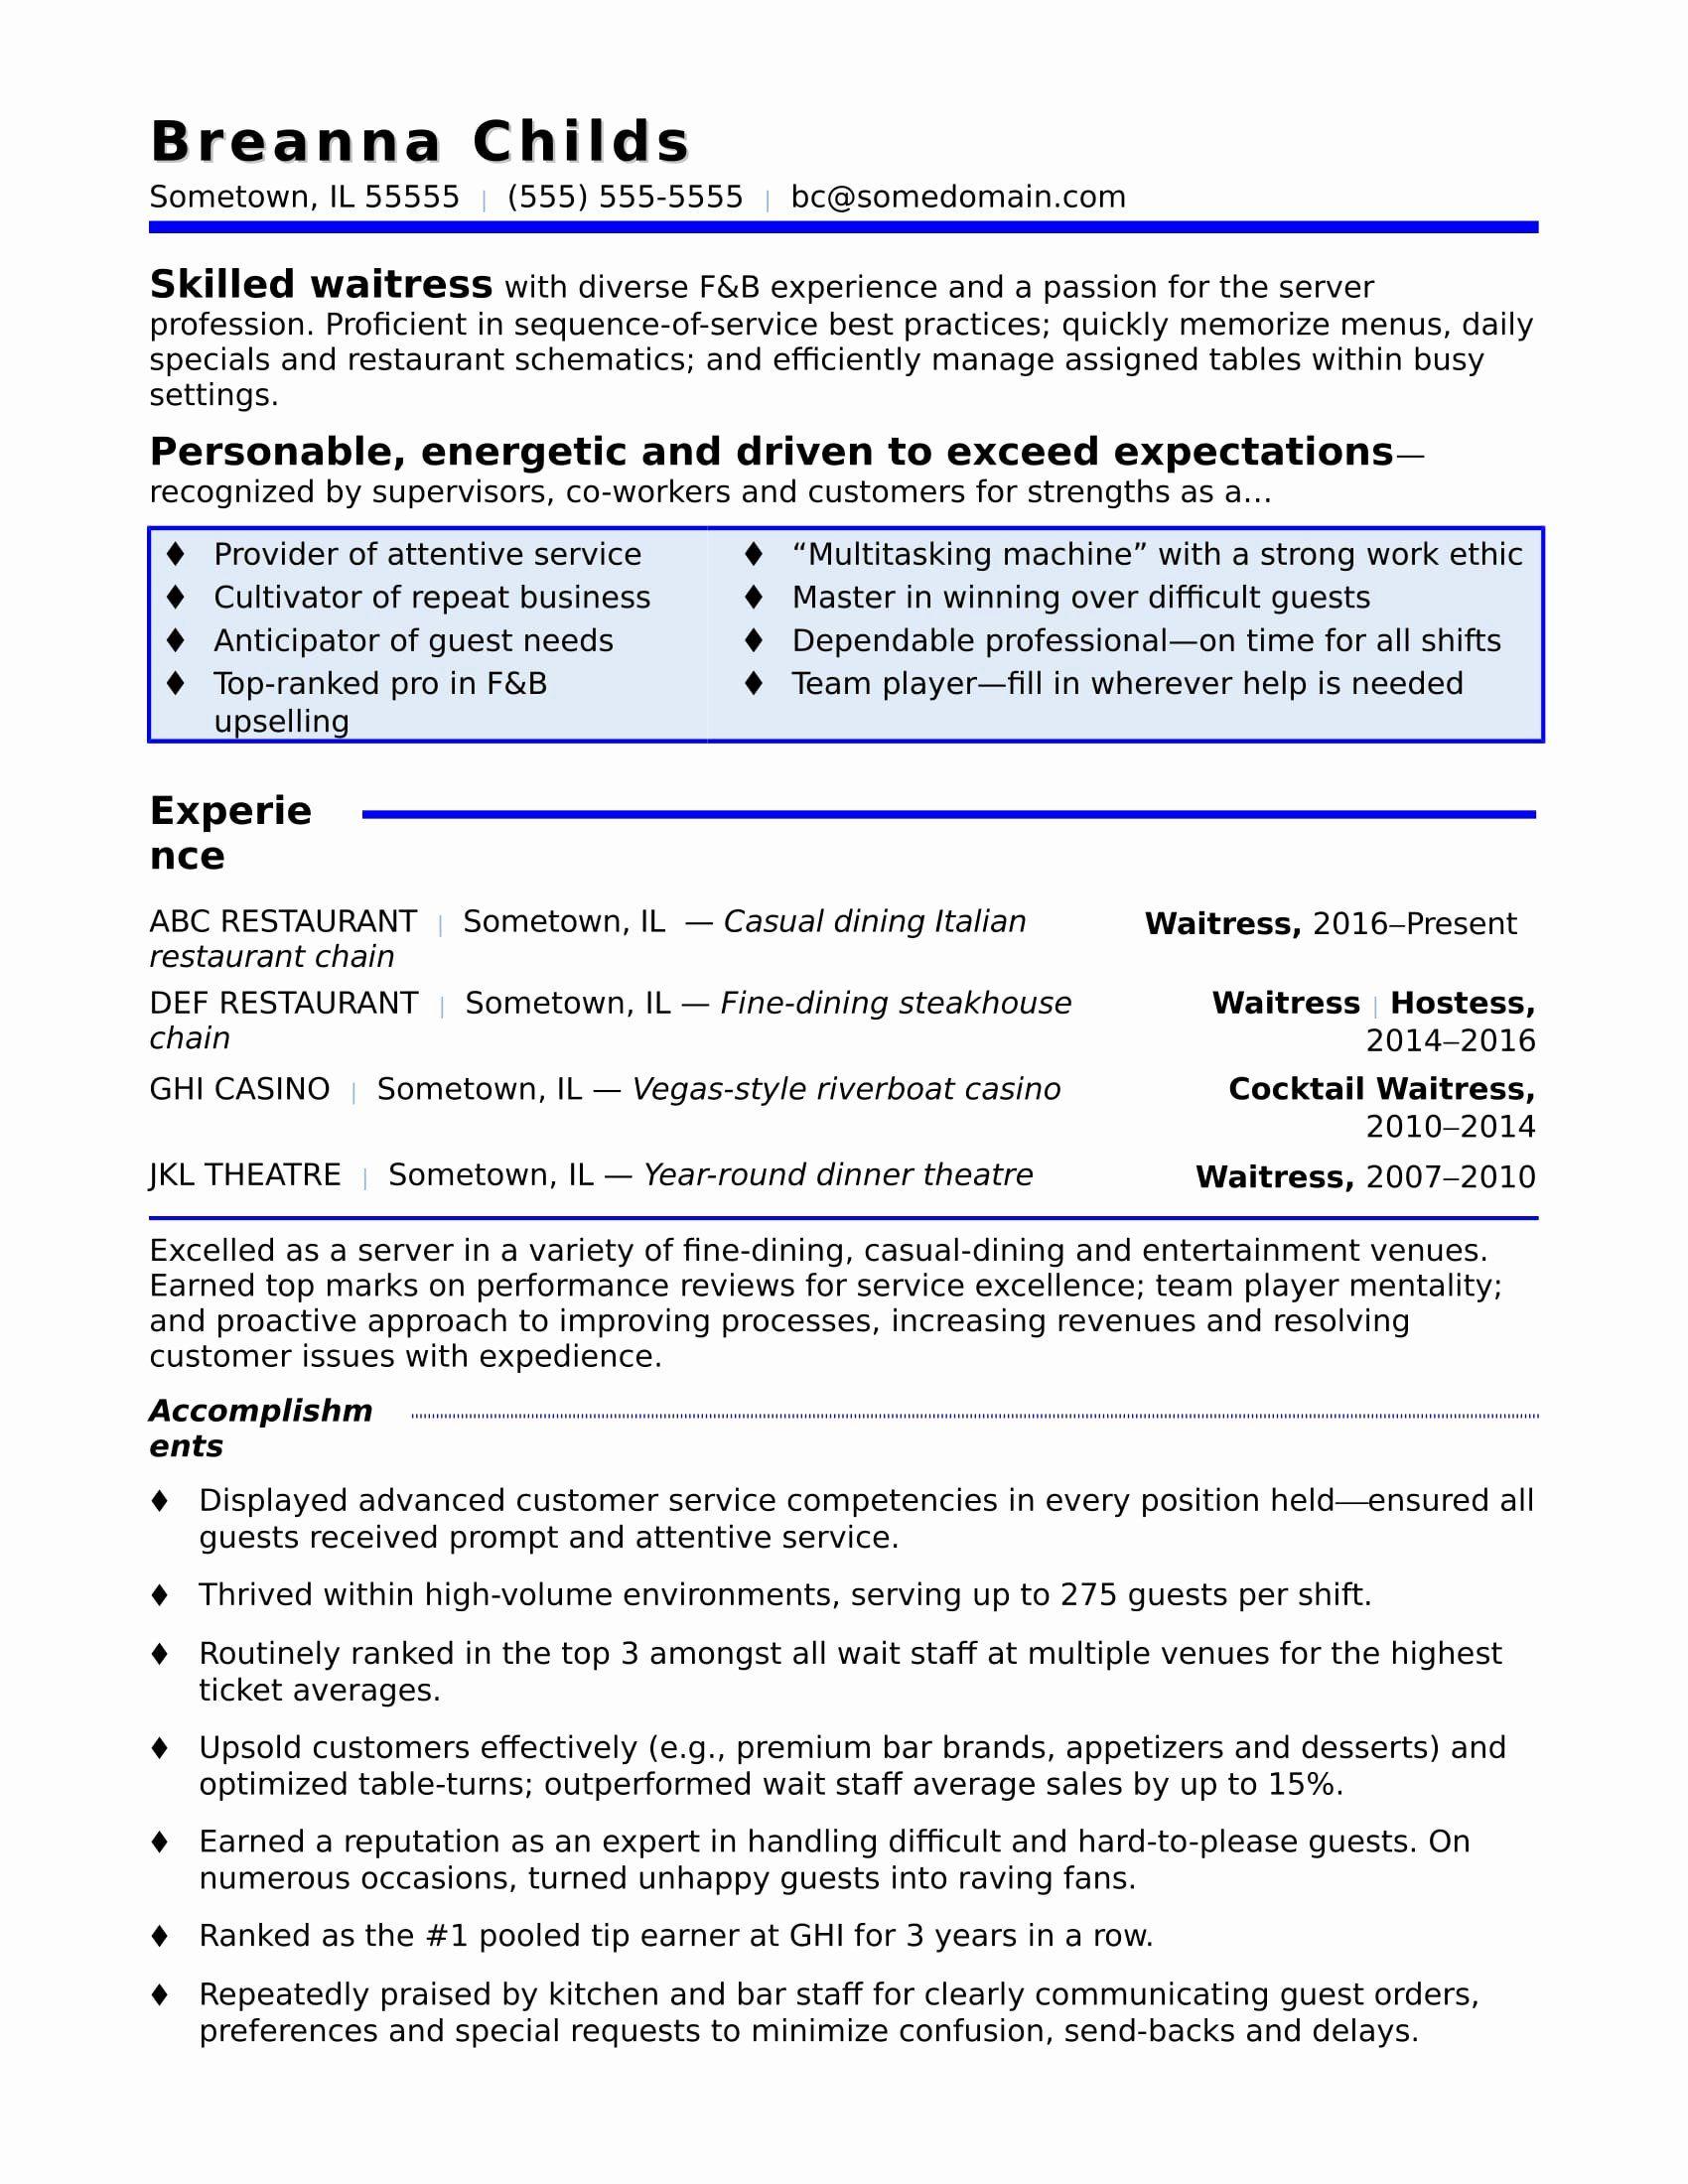 Waitress Skills For Resume Best Of Waitress Resume Sample Resume Writing Services Resume Examples Resume Tips